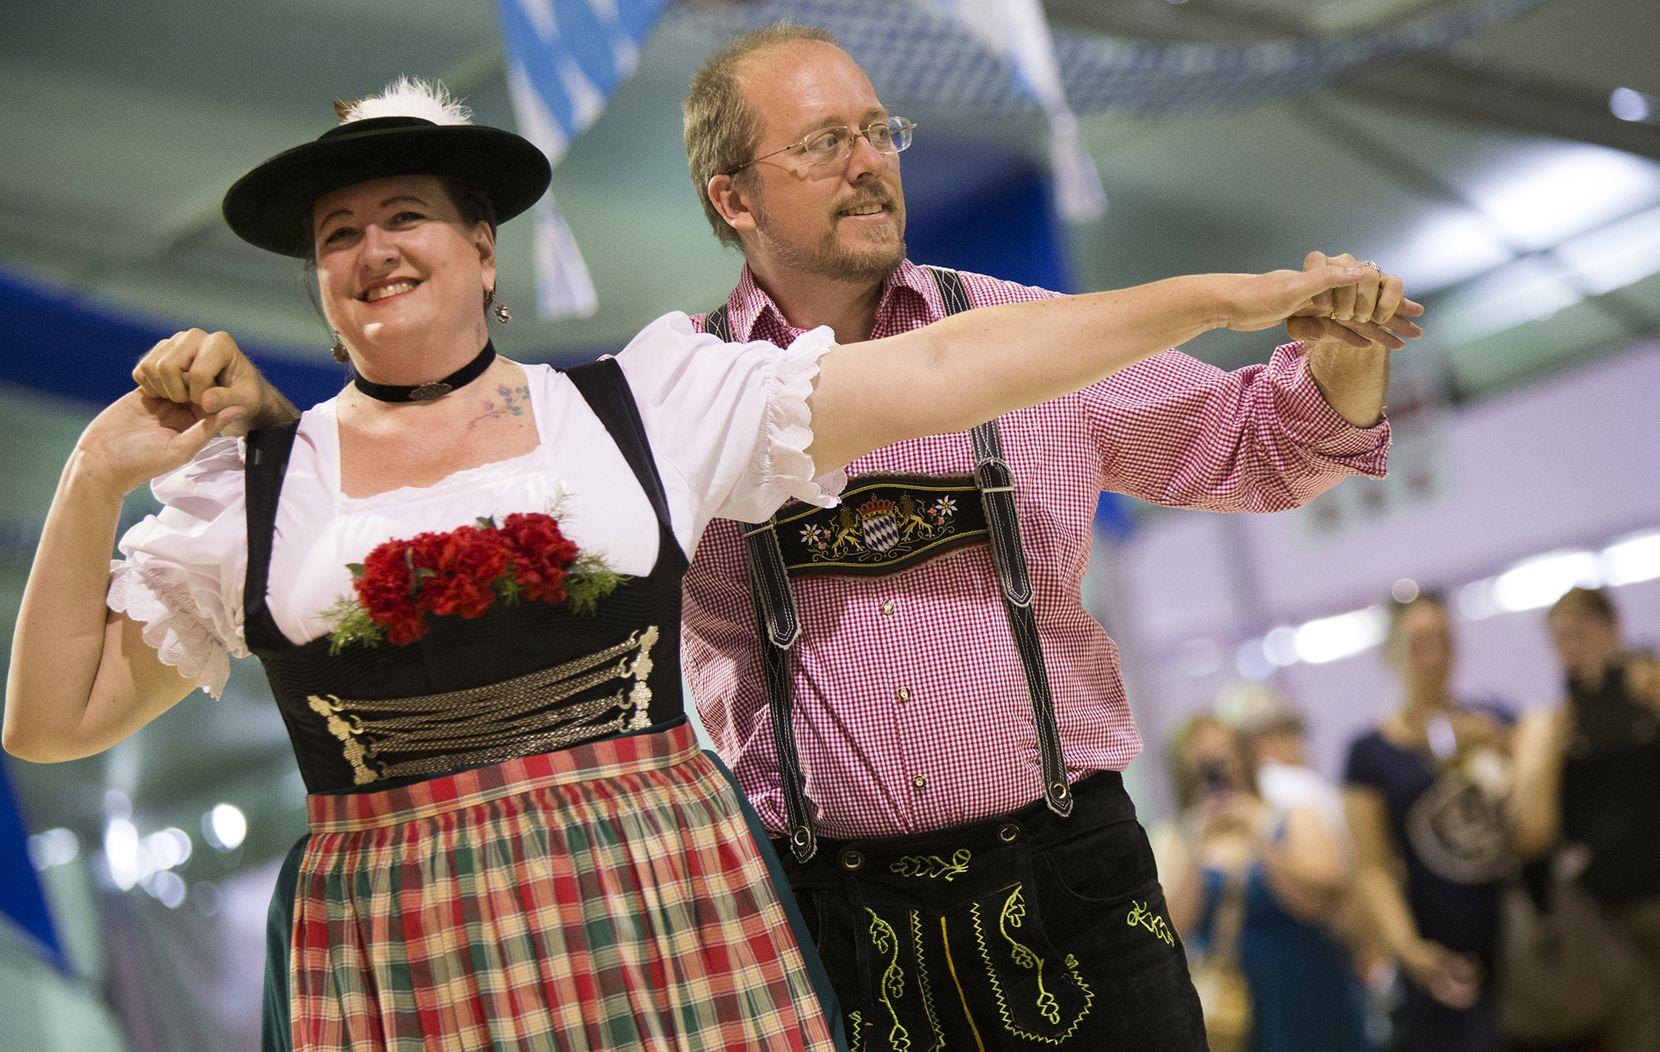 The Alpine Dancers from Garland perform during Addison Oktoberfest.